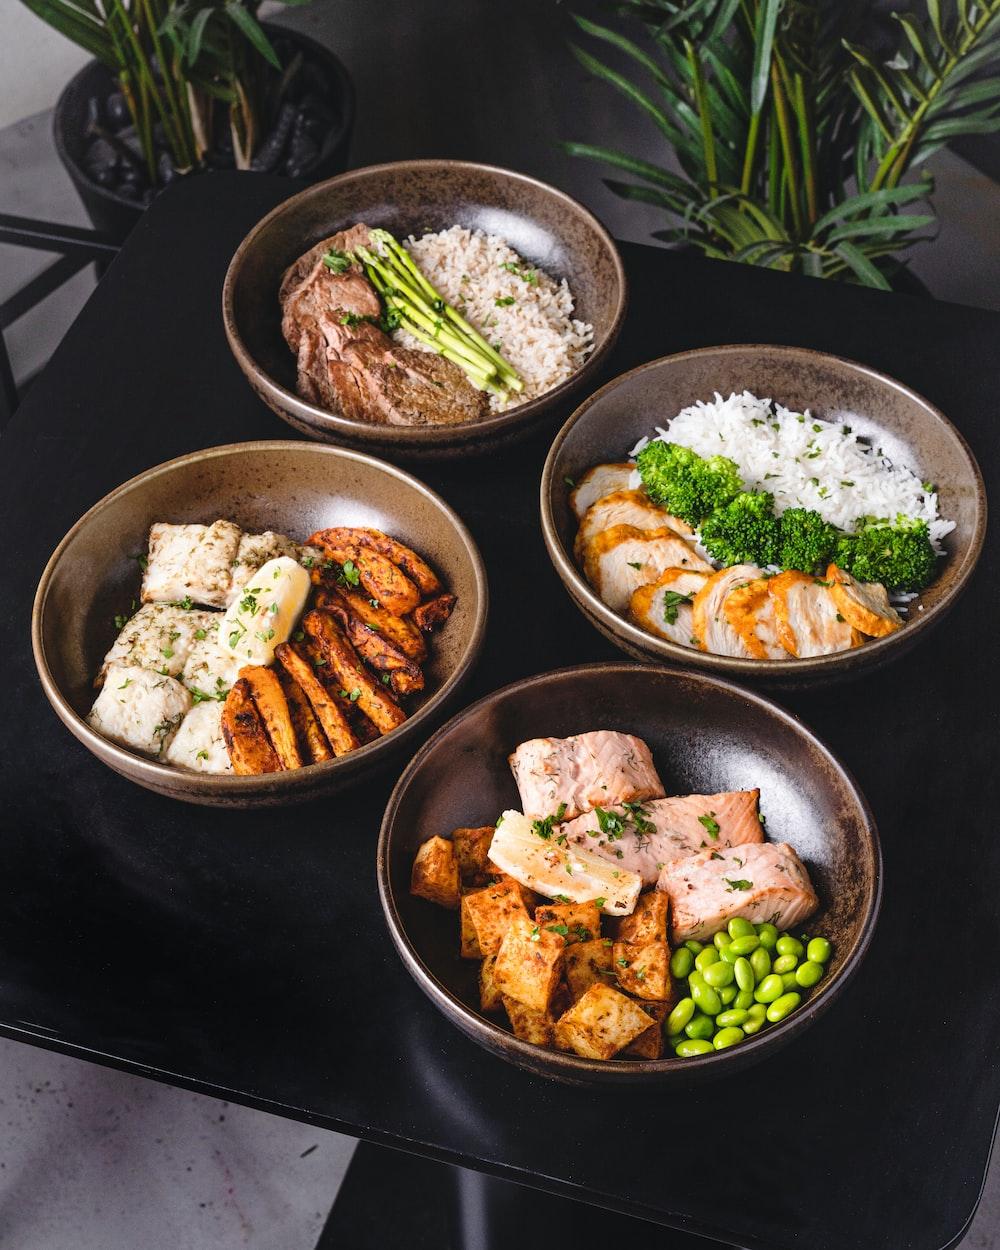 cooked food on black ceramic bowls